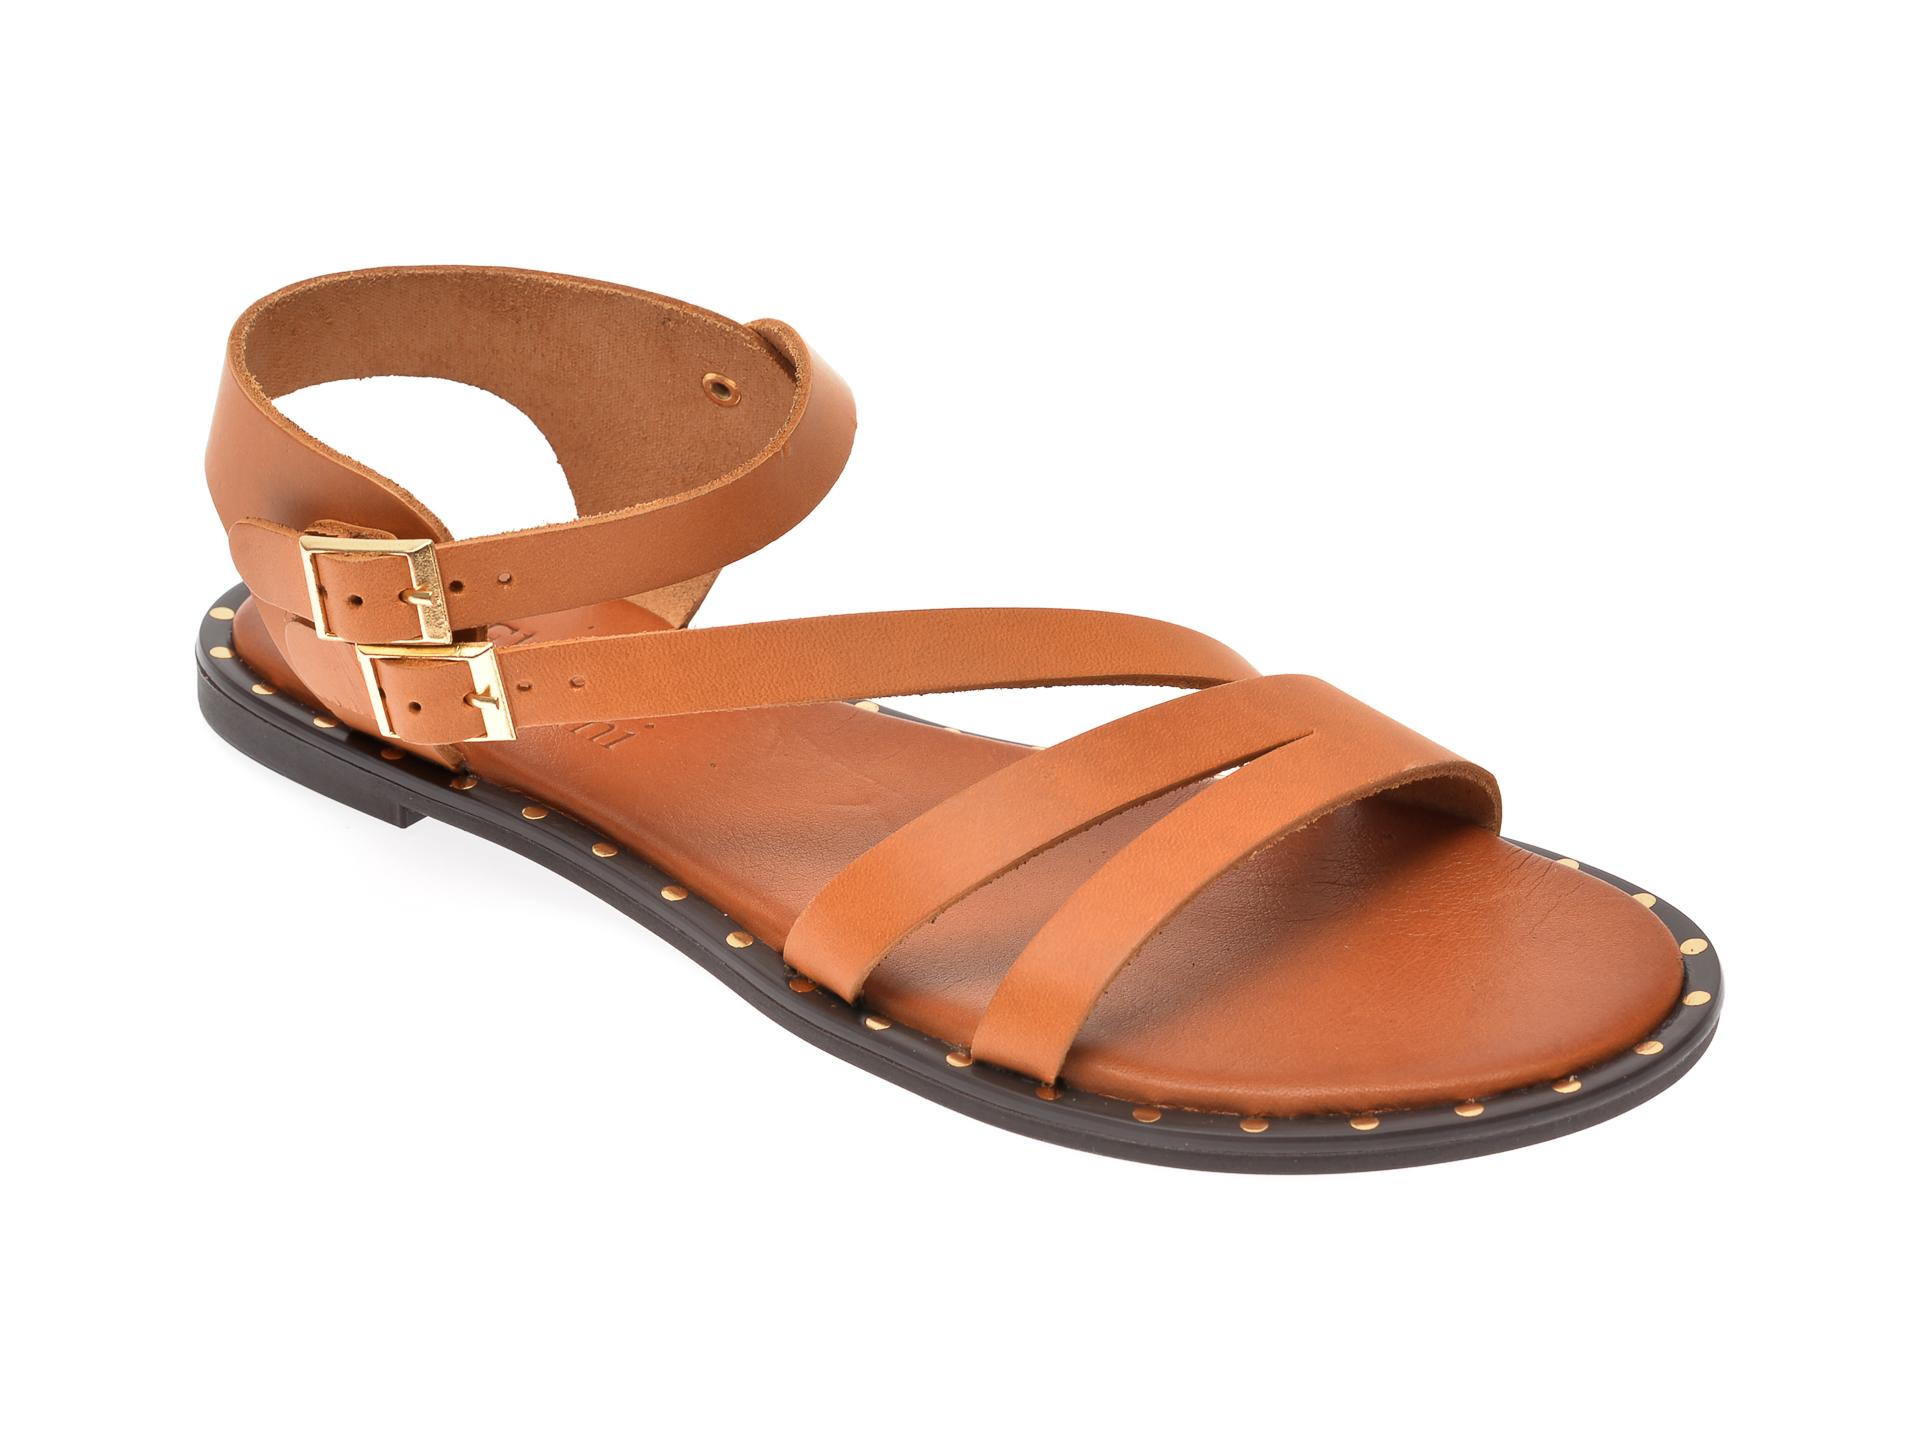 Sandale FLAVIA PASSINI maro, 1031, din piele naturala